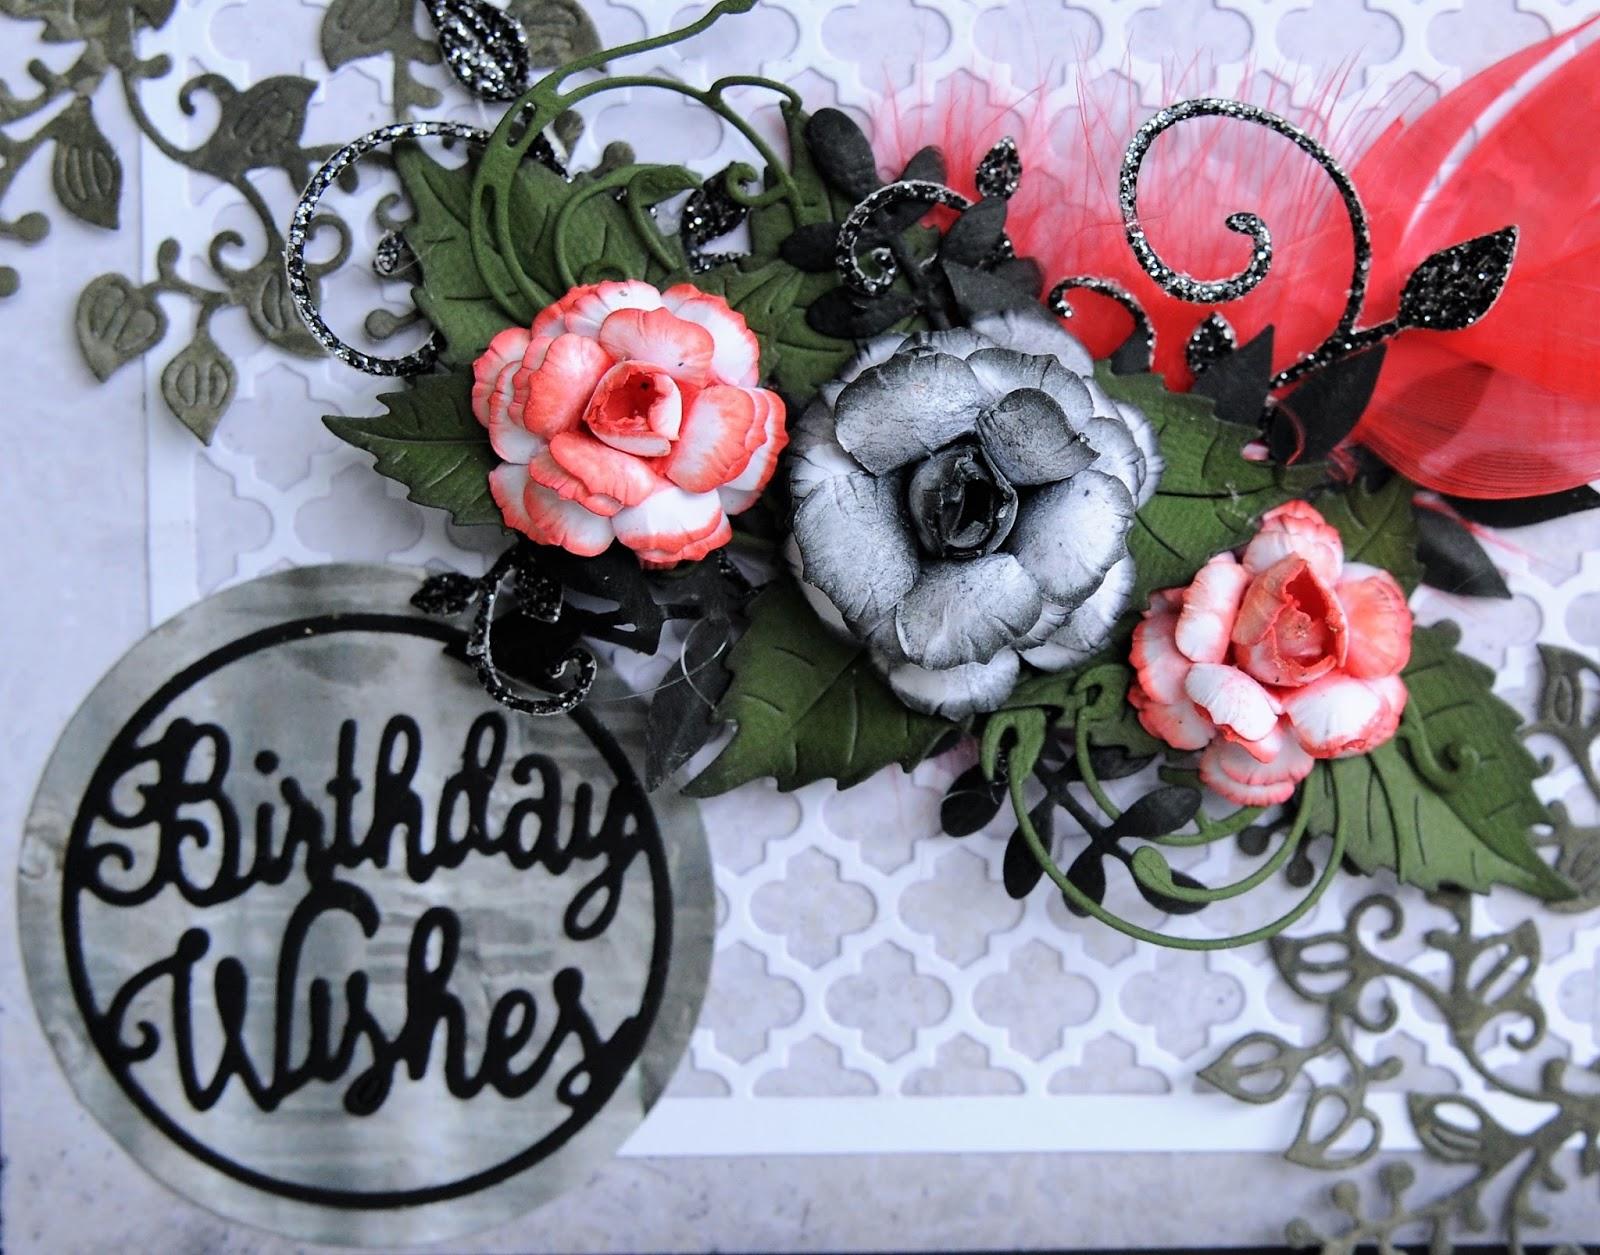 Birthday Wishes By Debbie Brownmiller Cheery Lynn Designs